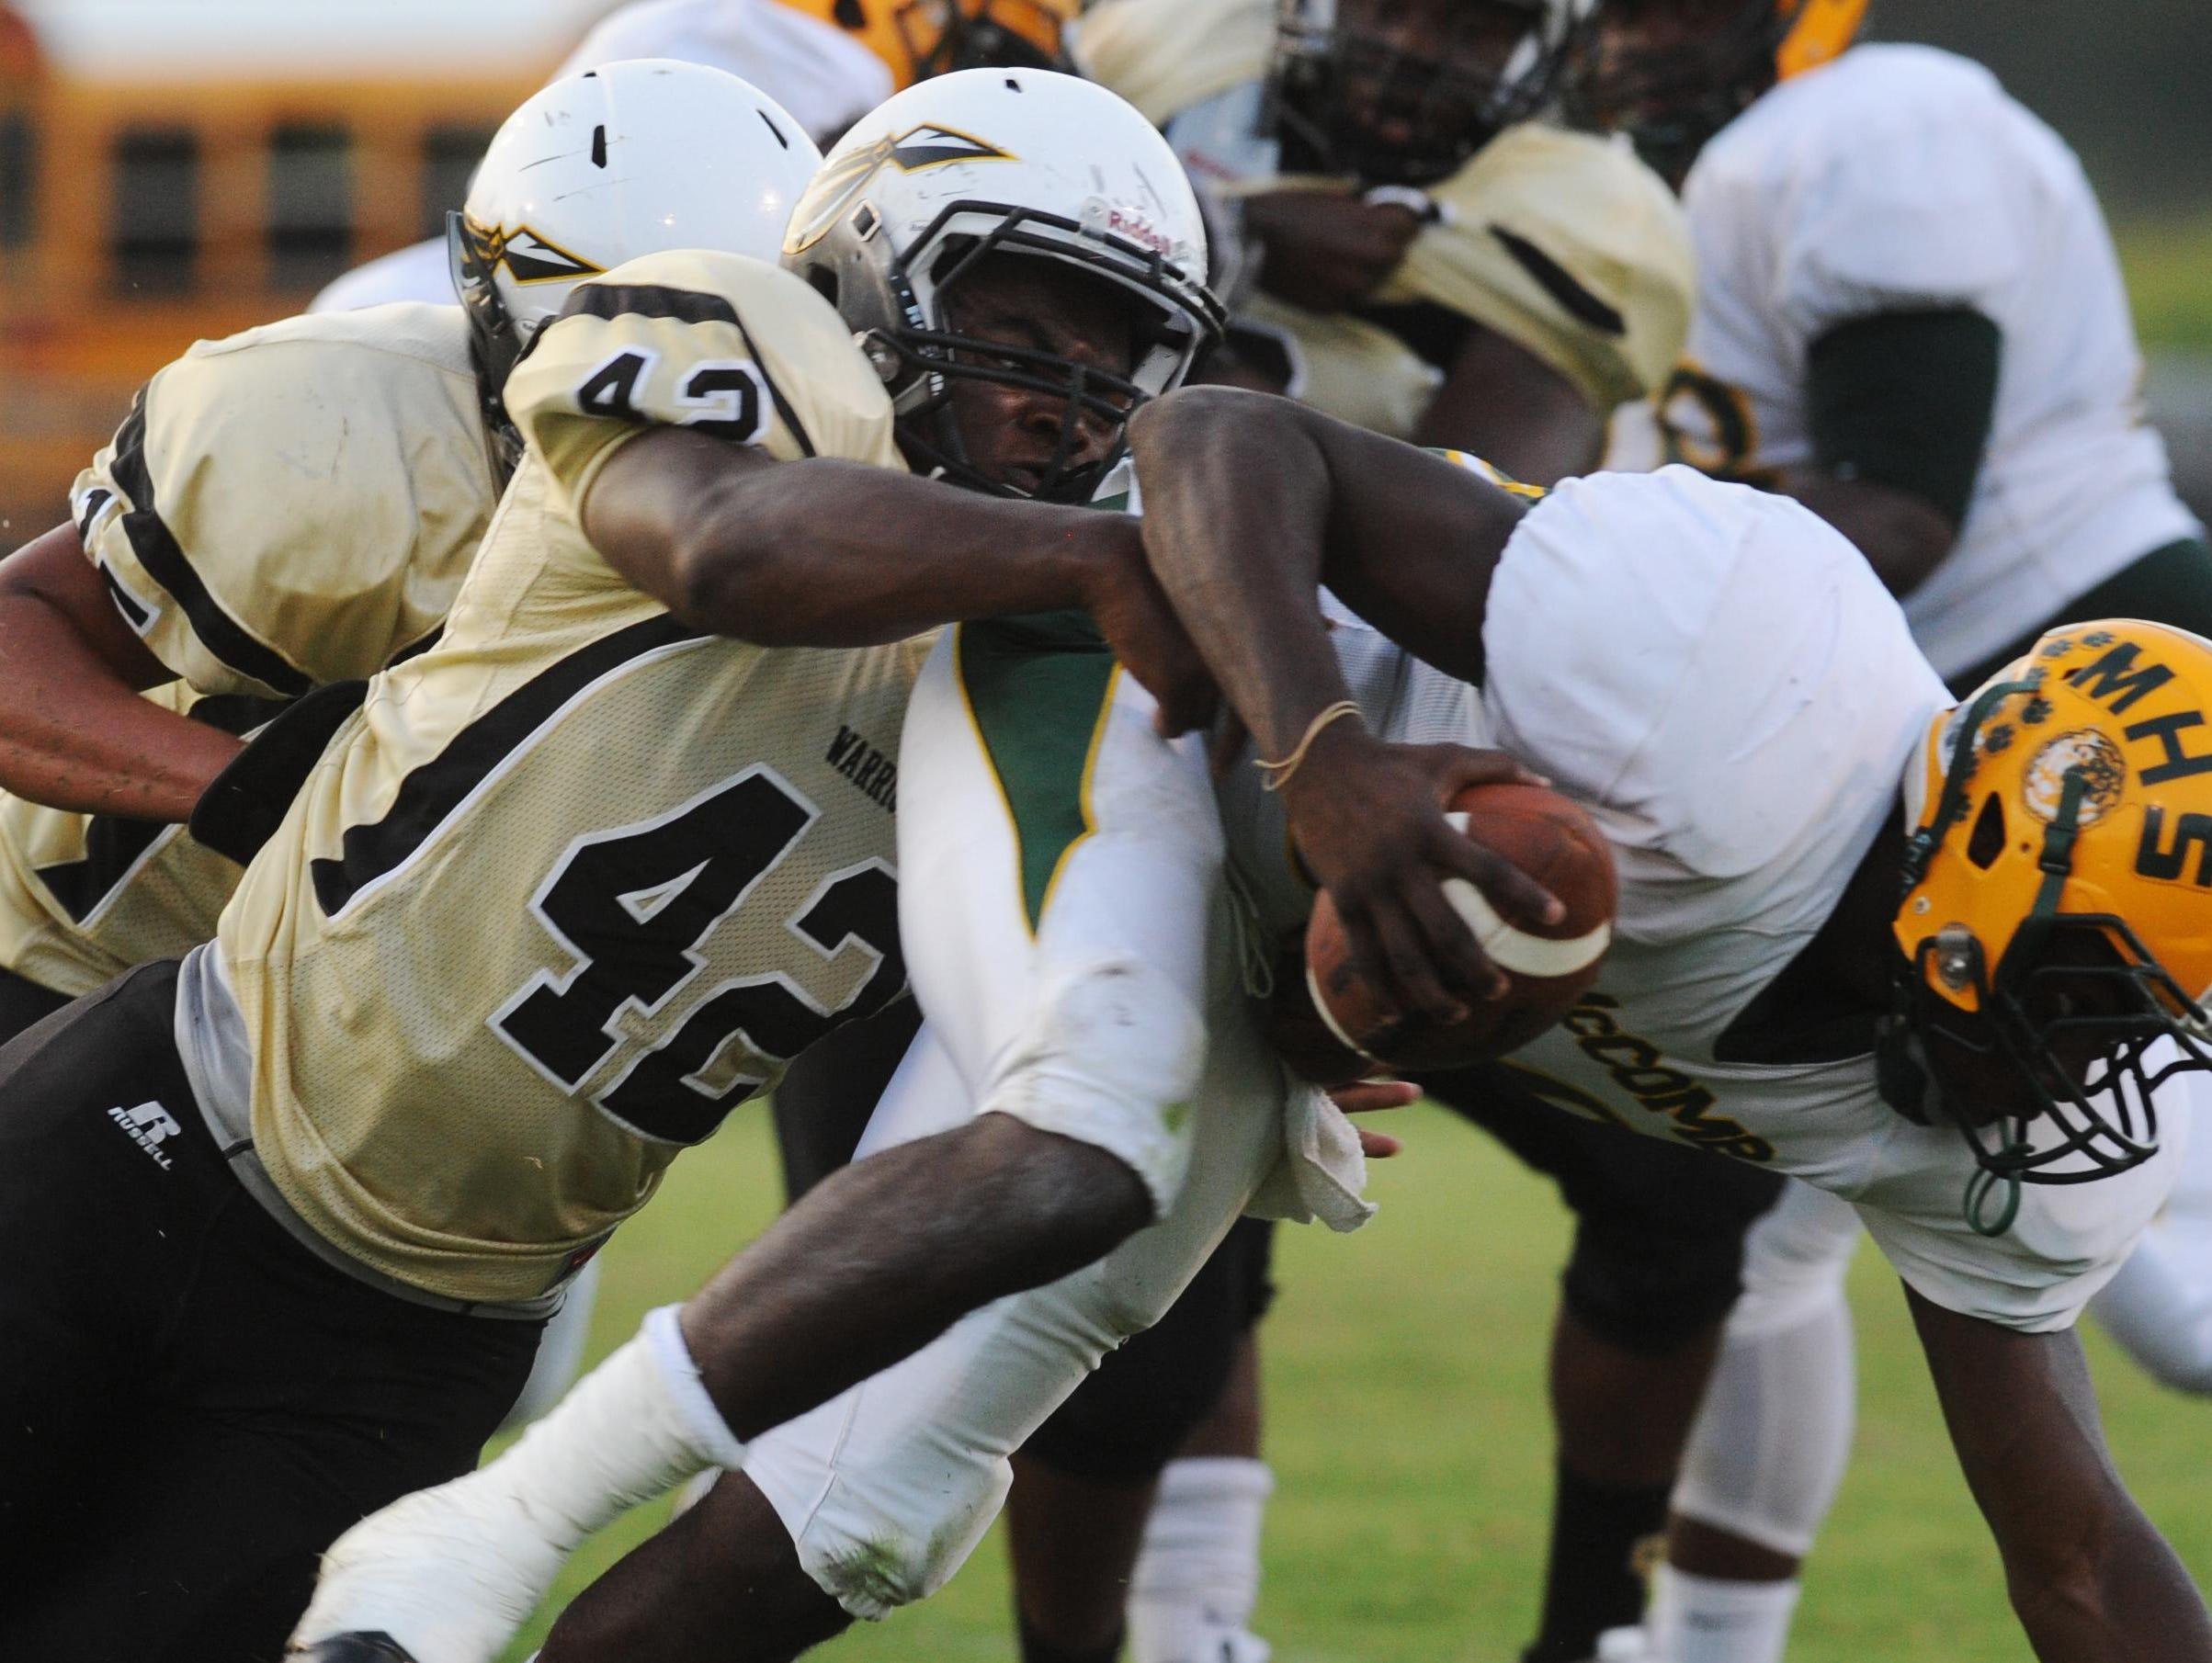 Oak Grove defensive end Deontae Haynes had a team-high 143 tackles last season.